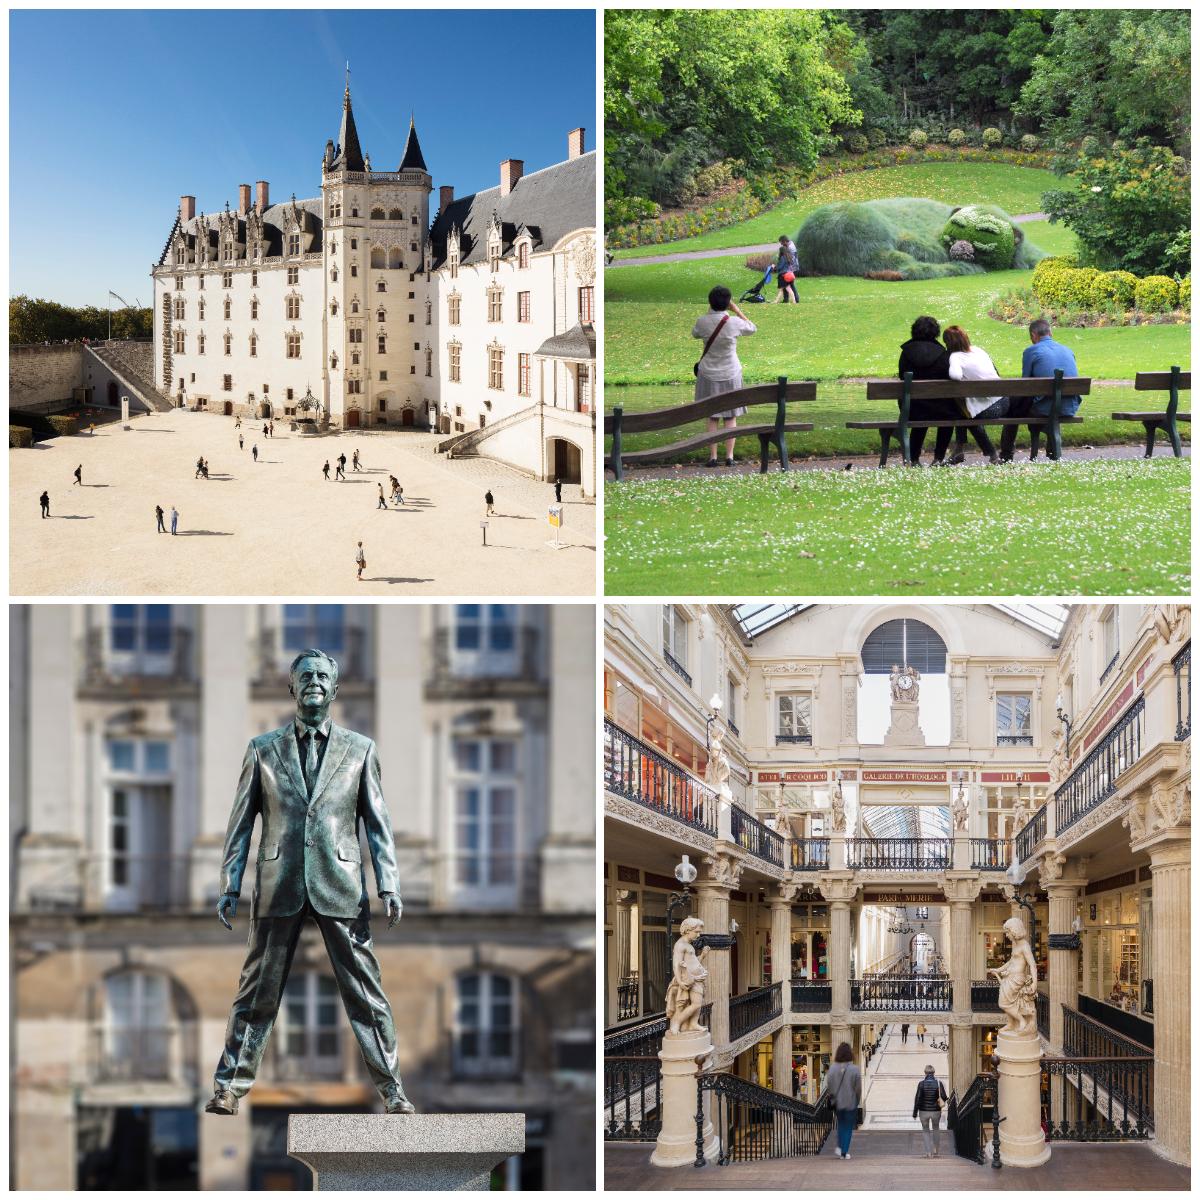 Sprankelende binnenstad Nantes 2021